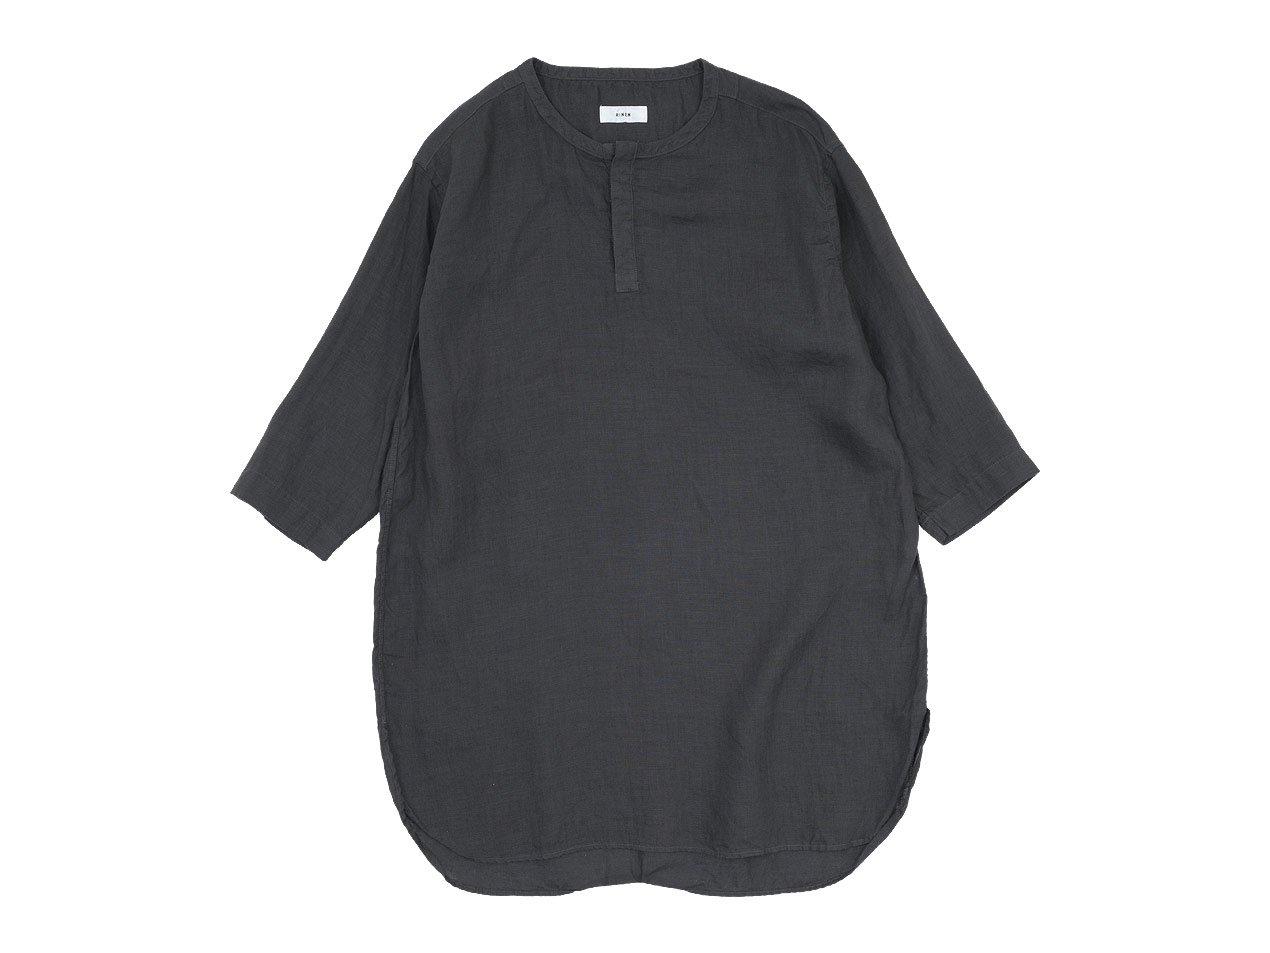 RINEN 60/1リネンローン 七分袖比翼バンドカラーシャツ 07 BROWN〔レディース〕